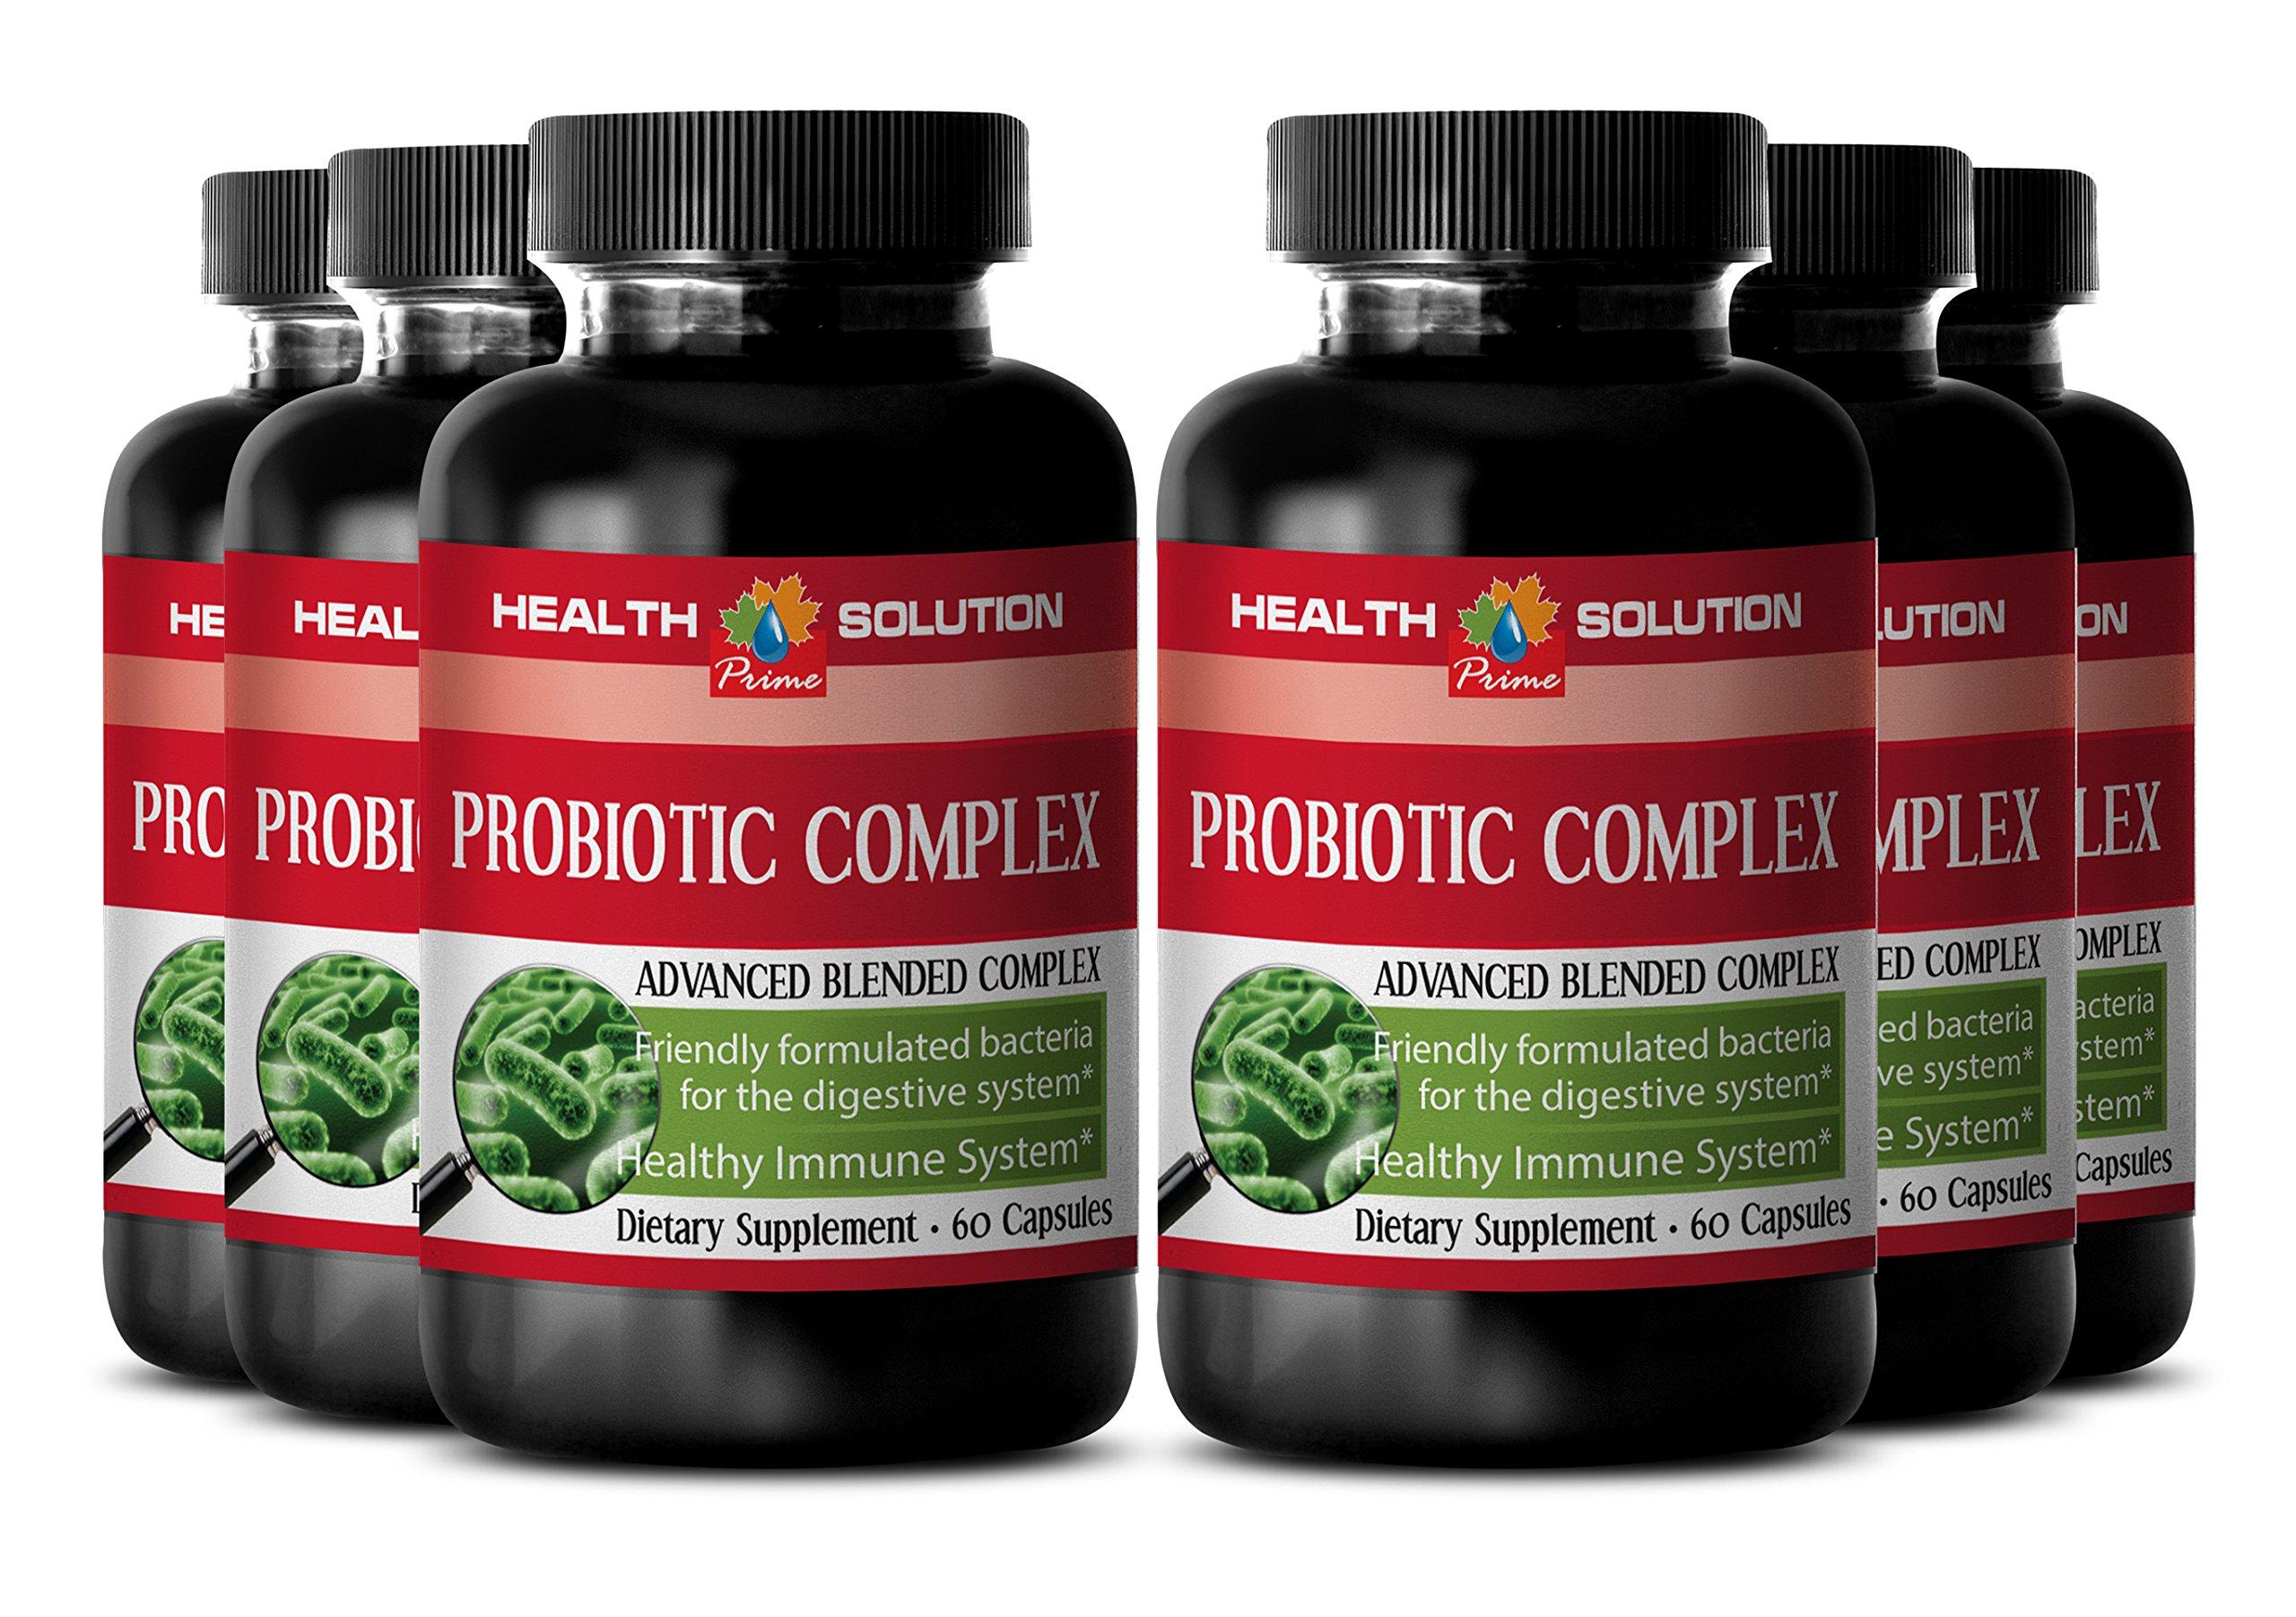 Probiotic immune support - PROBIOTIC COMPLEX 550MG - boost immune system response (6 Bottles)